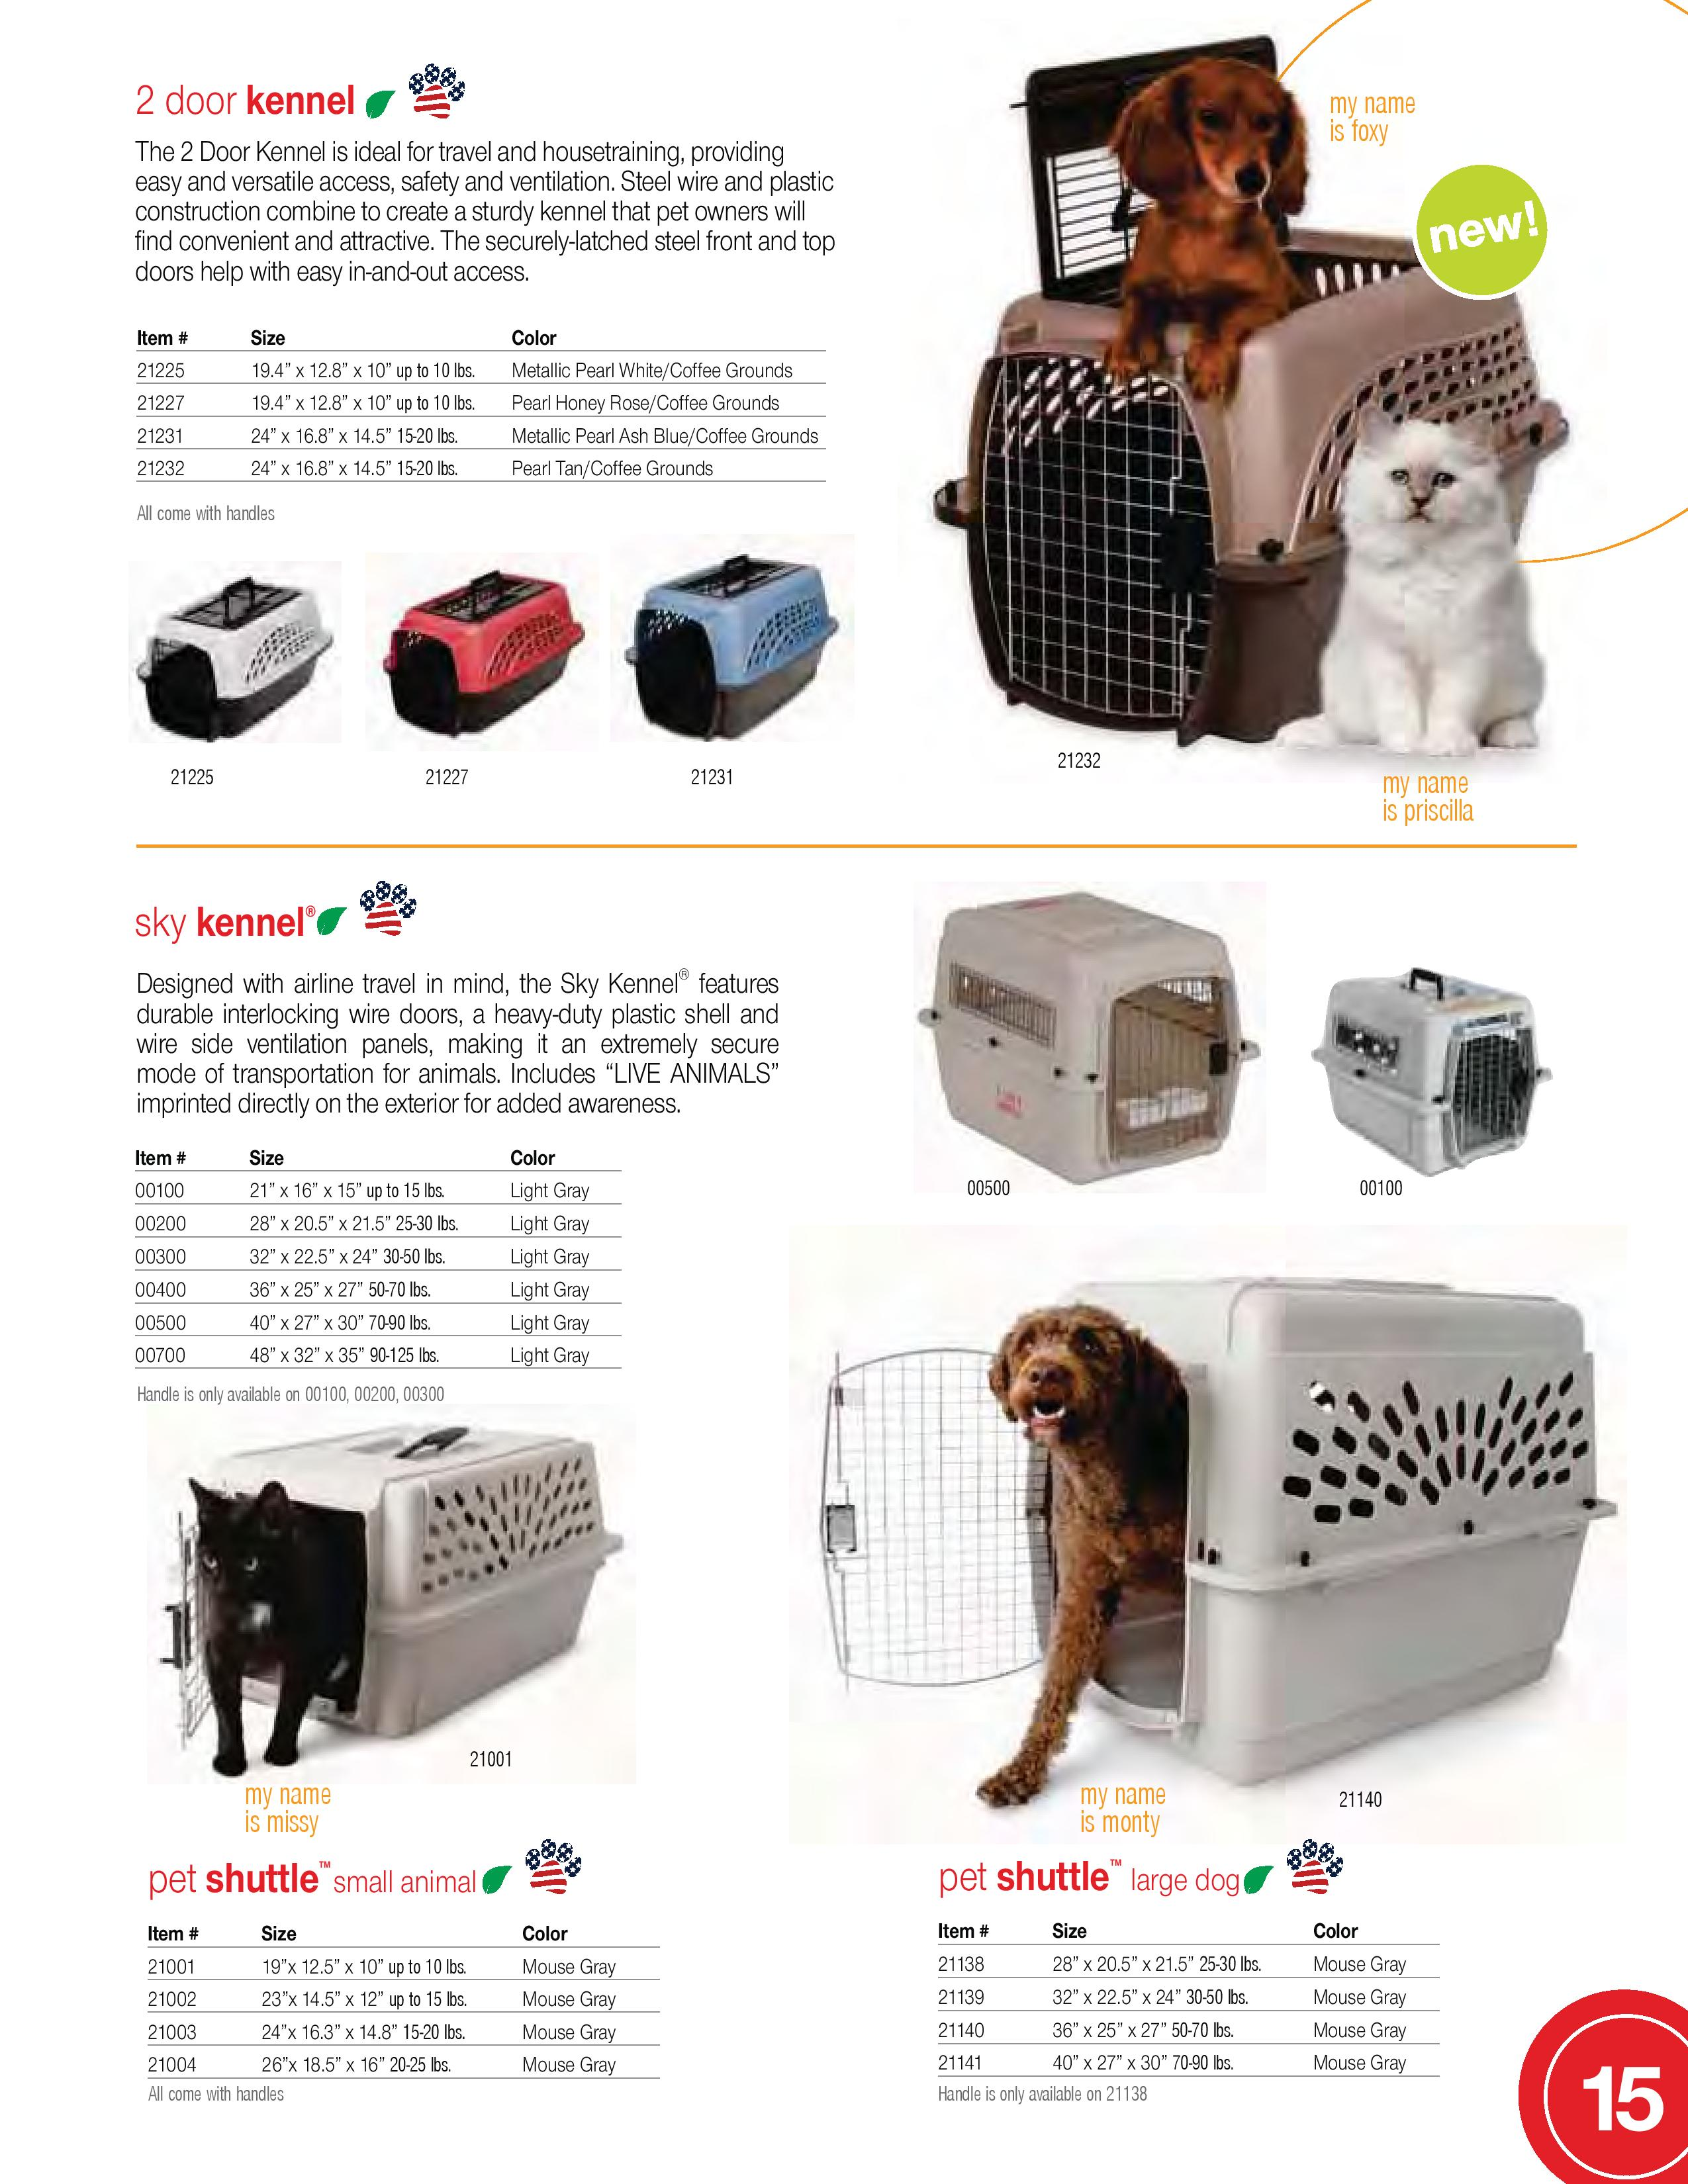 Emirtaes Animals Export 1 (15)